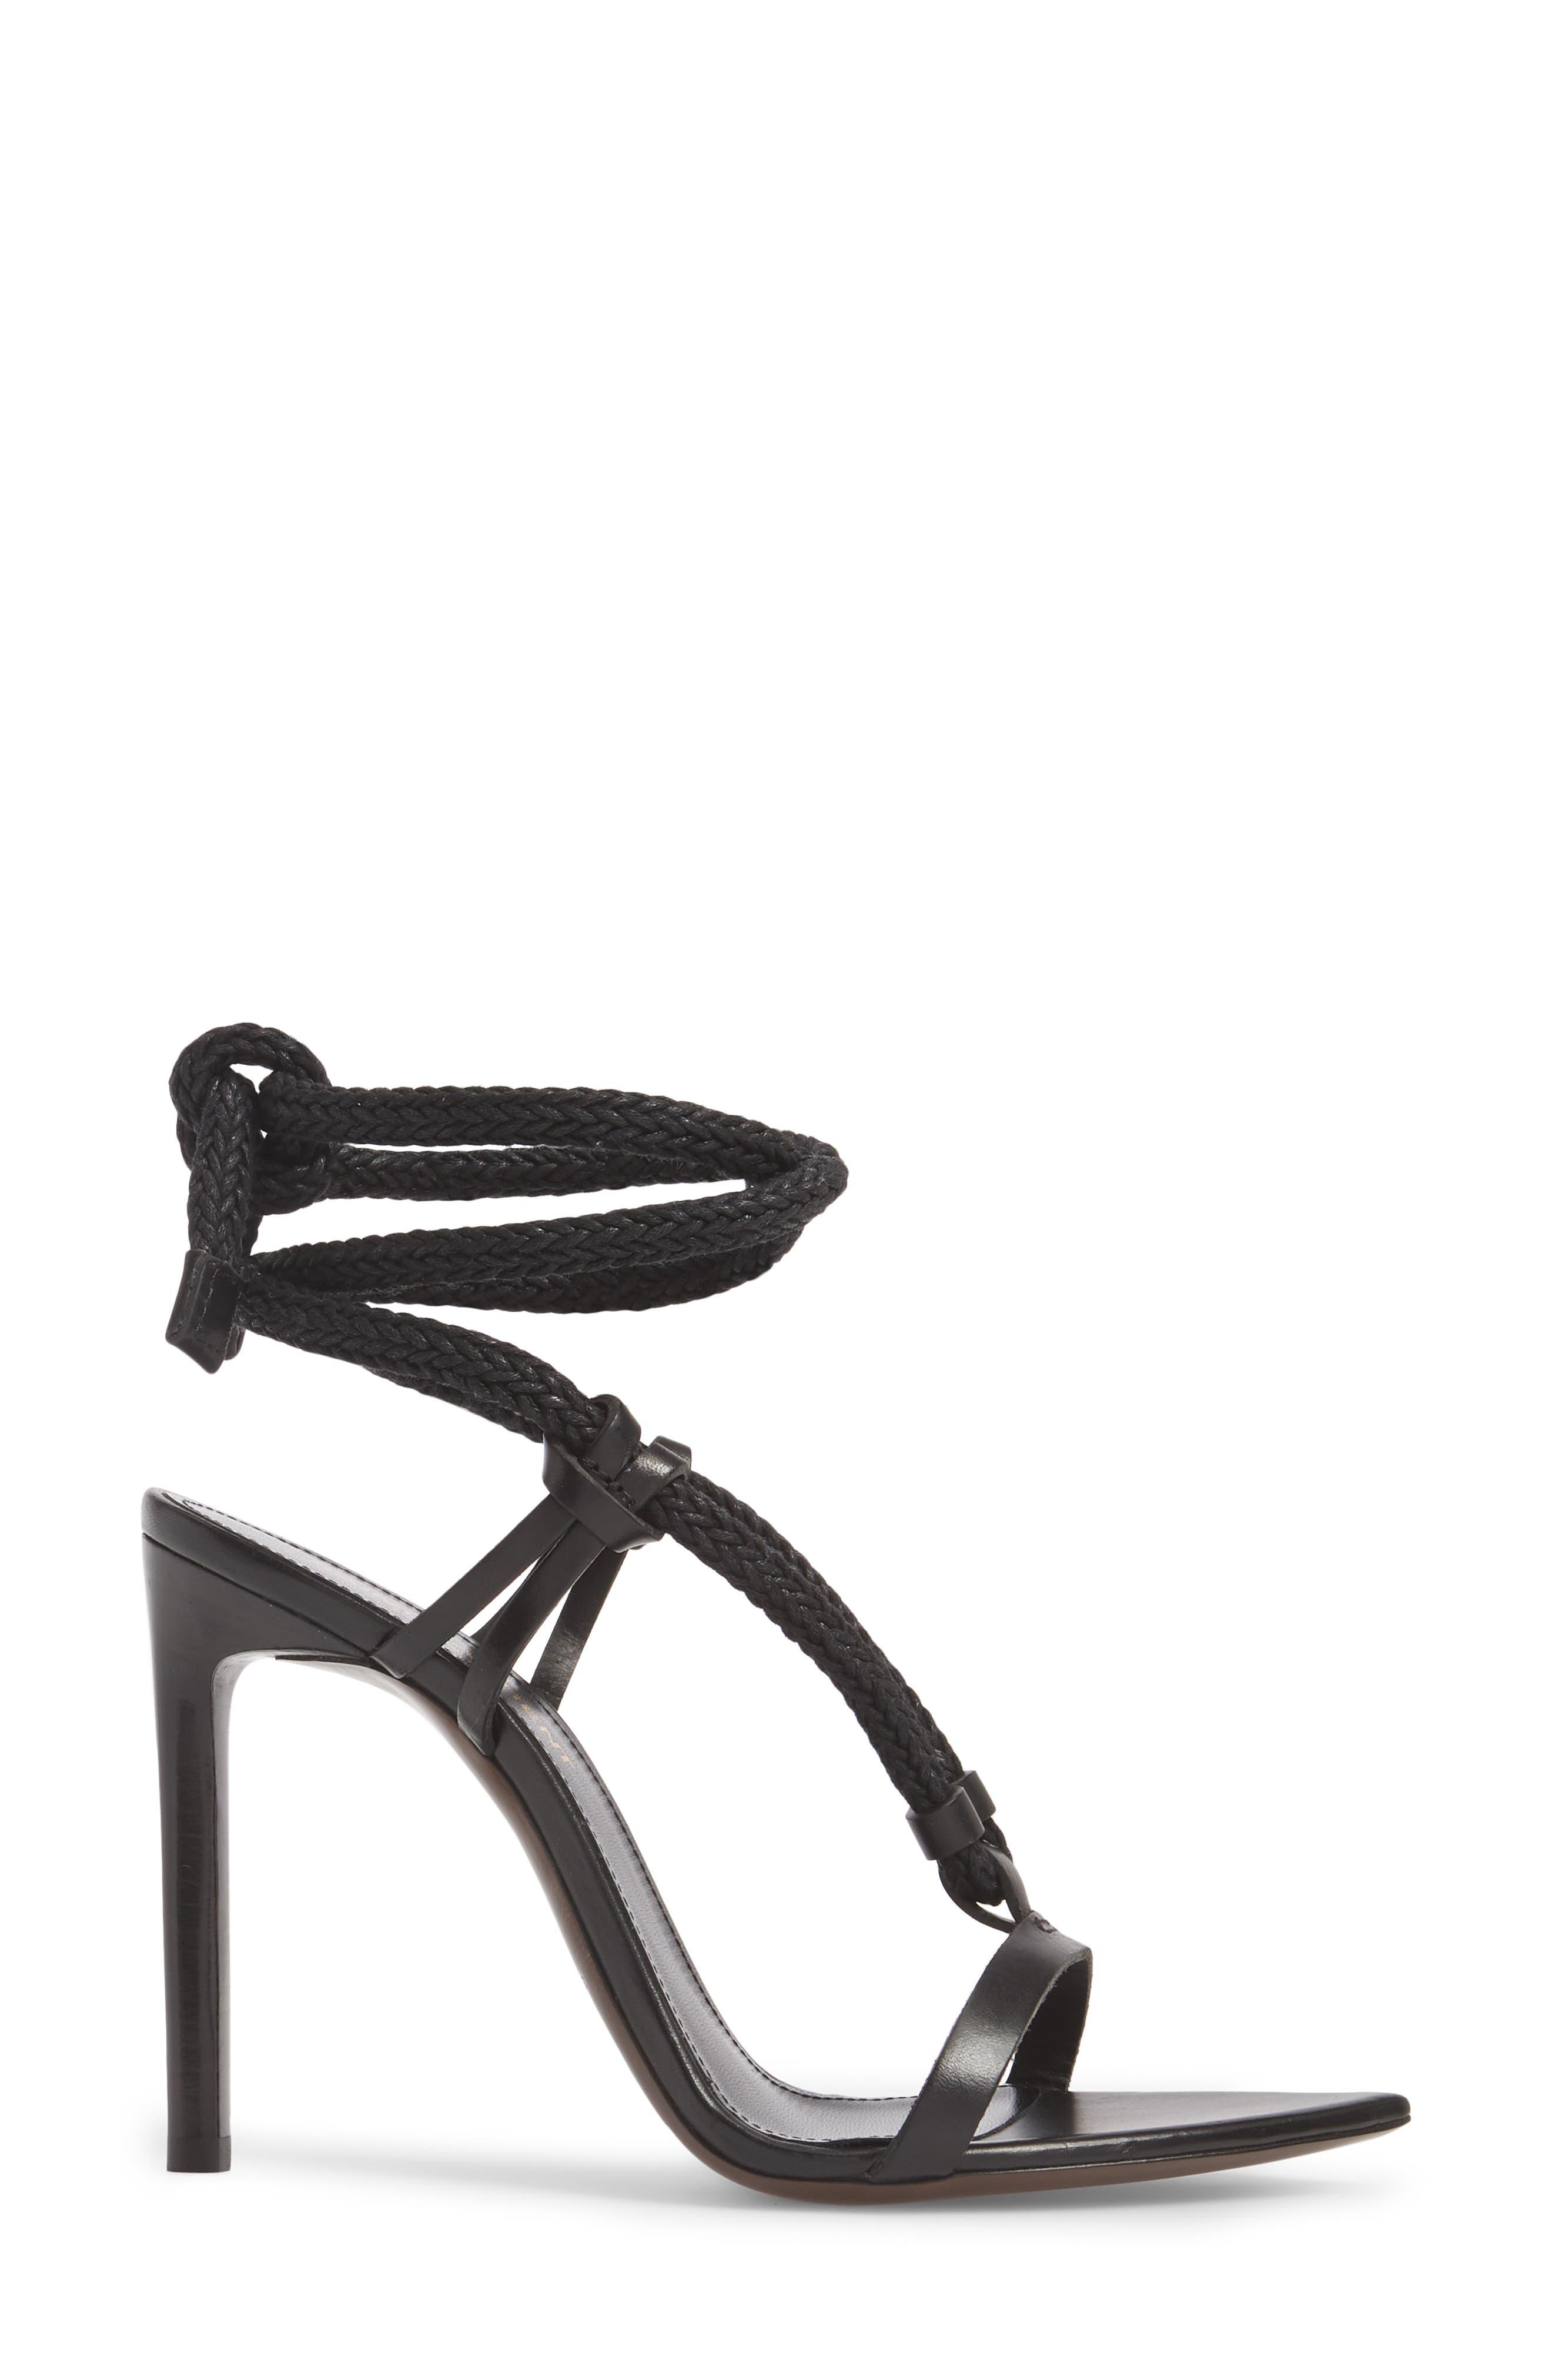 Majorelle Ankle Tie Sandal,                             Alternate thumbnail 3, color,                             001